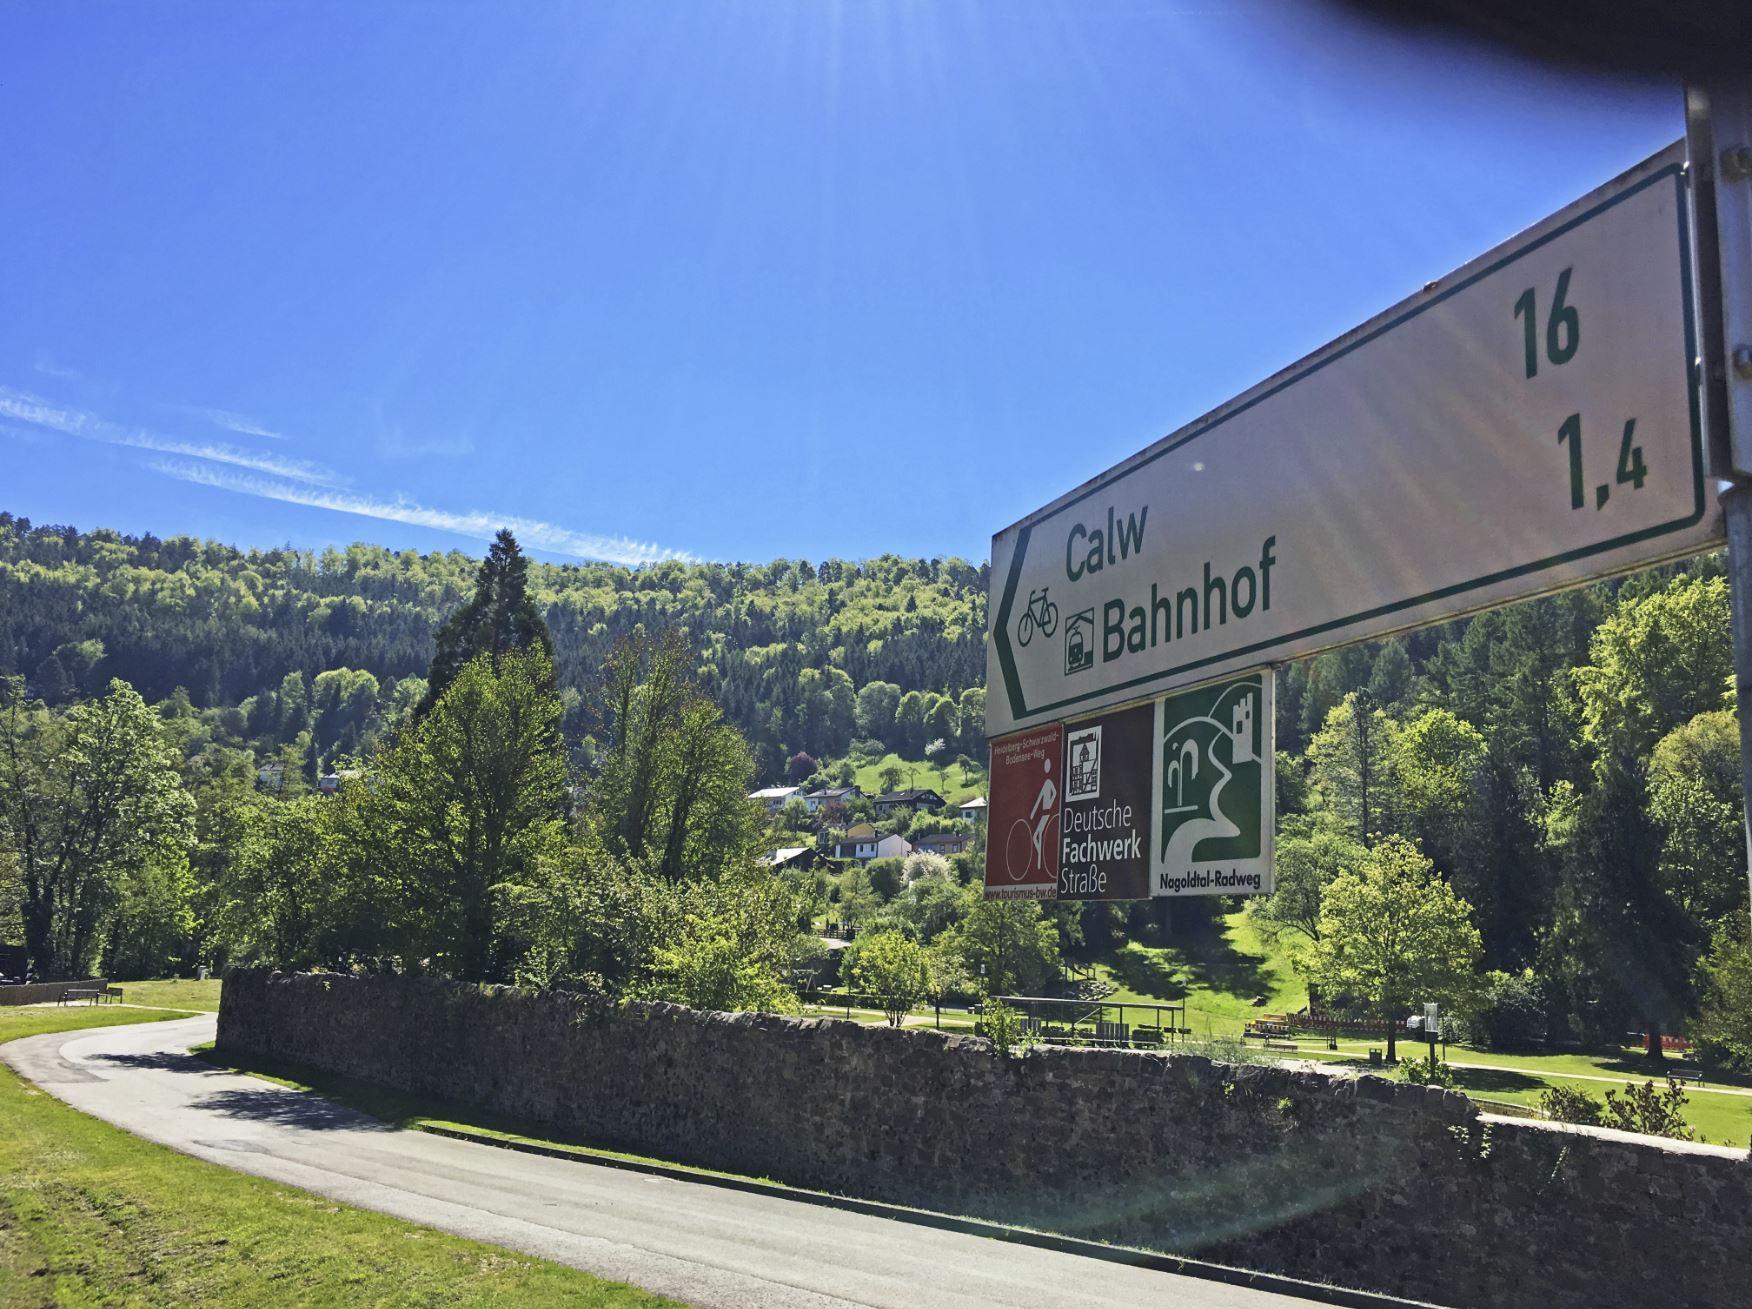 Radwegeschild Nagoldtalradweg